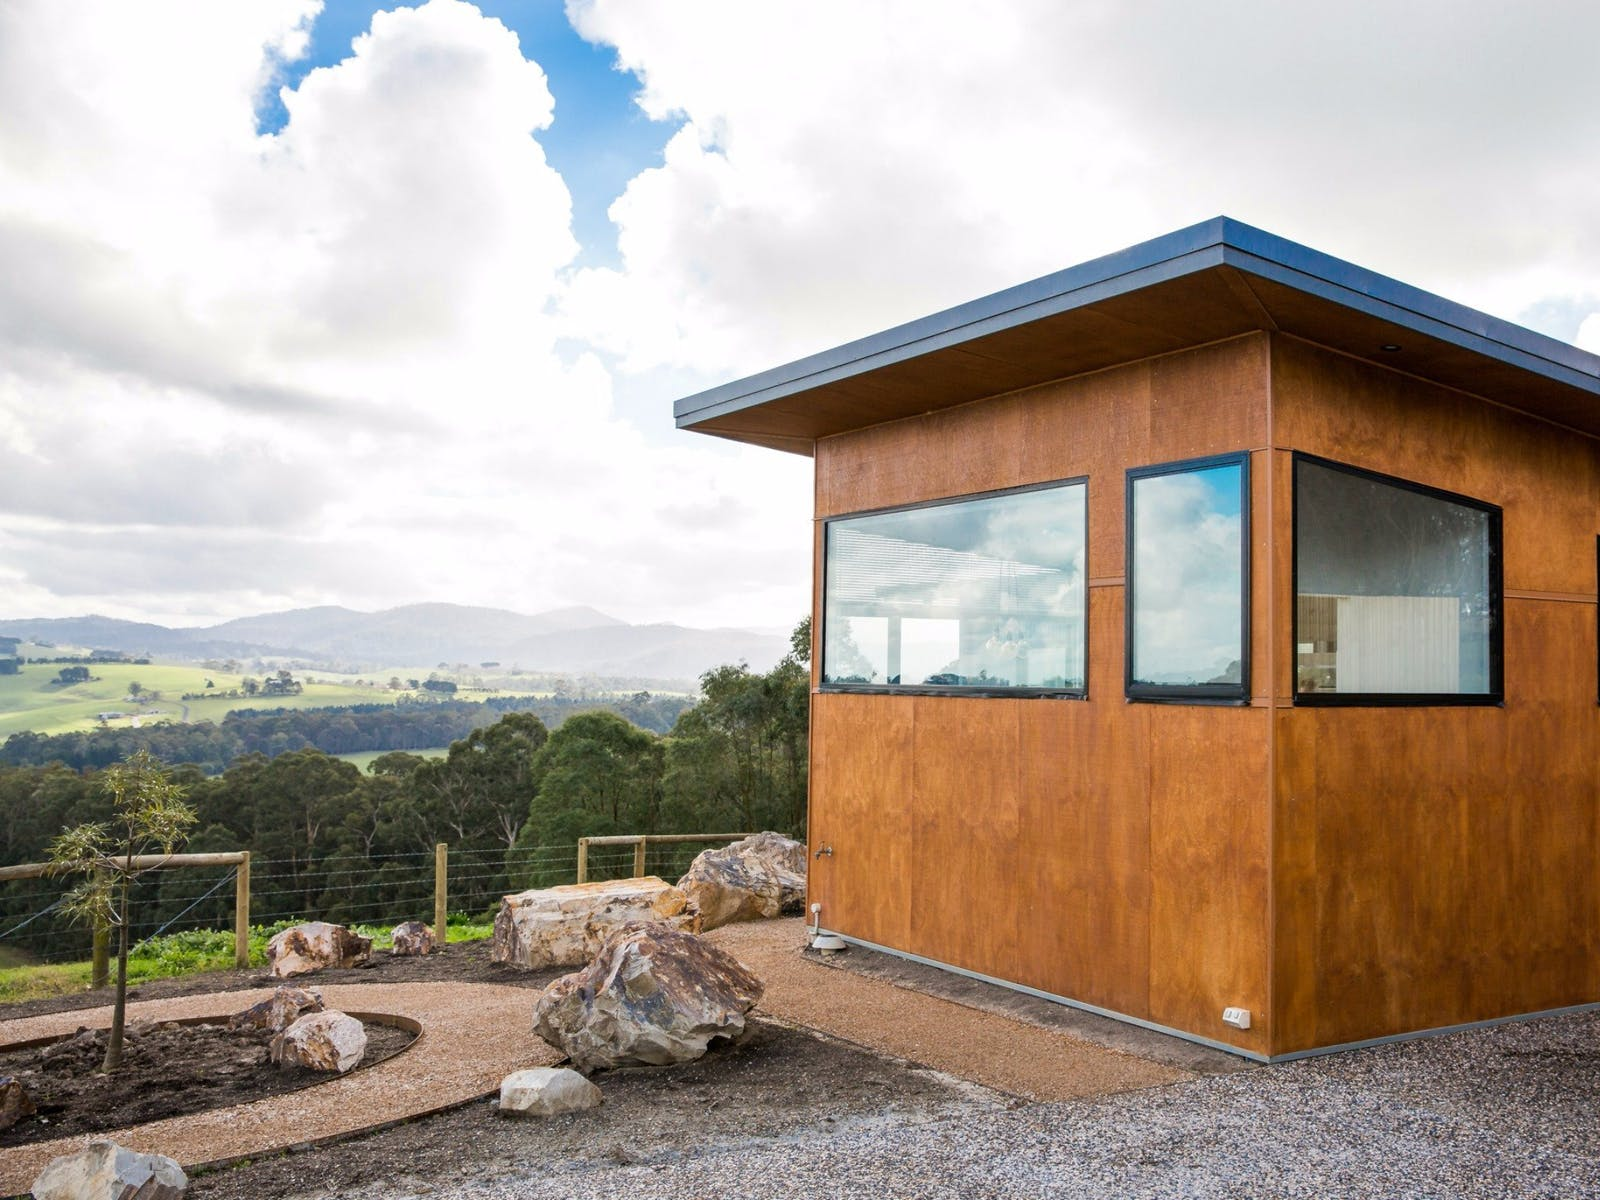 5 star luxury accommodation